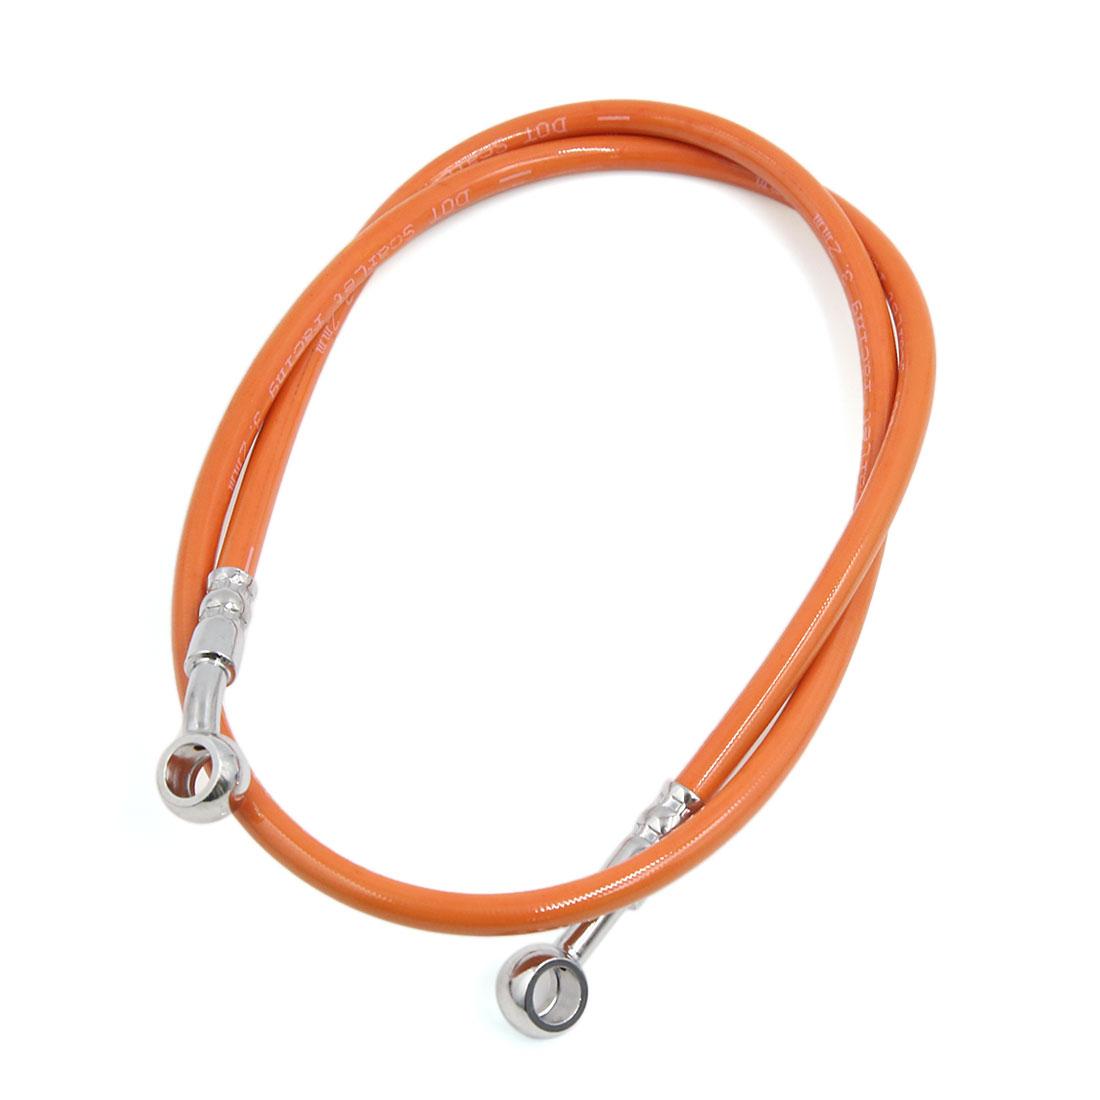 Universal 100cm Orange Stainless Steel Rubber Brake Oil Hose Line for Motorcycle